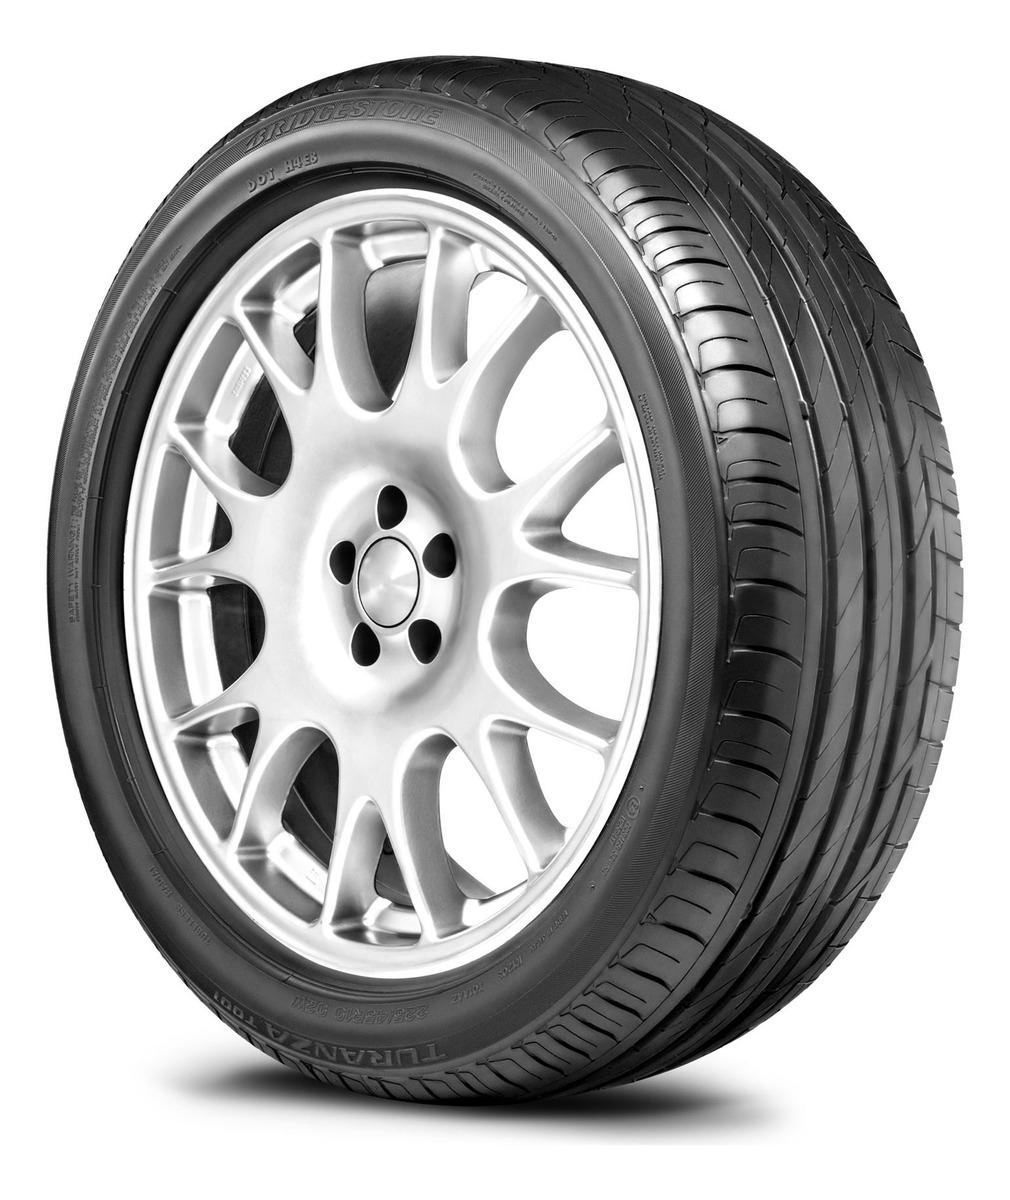 Neumático 225/50R18 95W TURANZA T001 RFT BRIDGESTONE